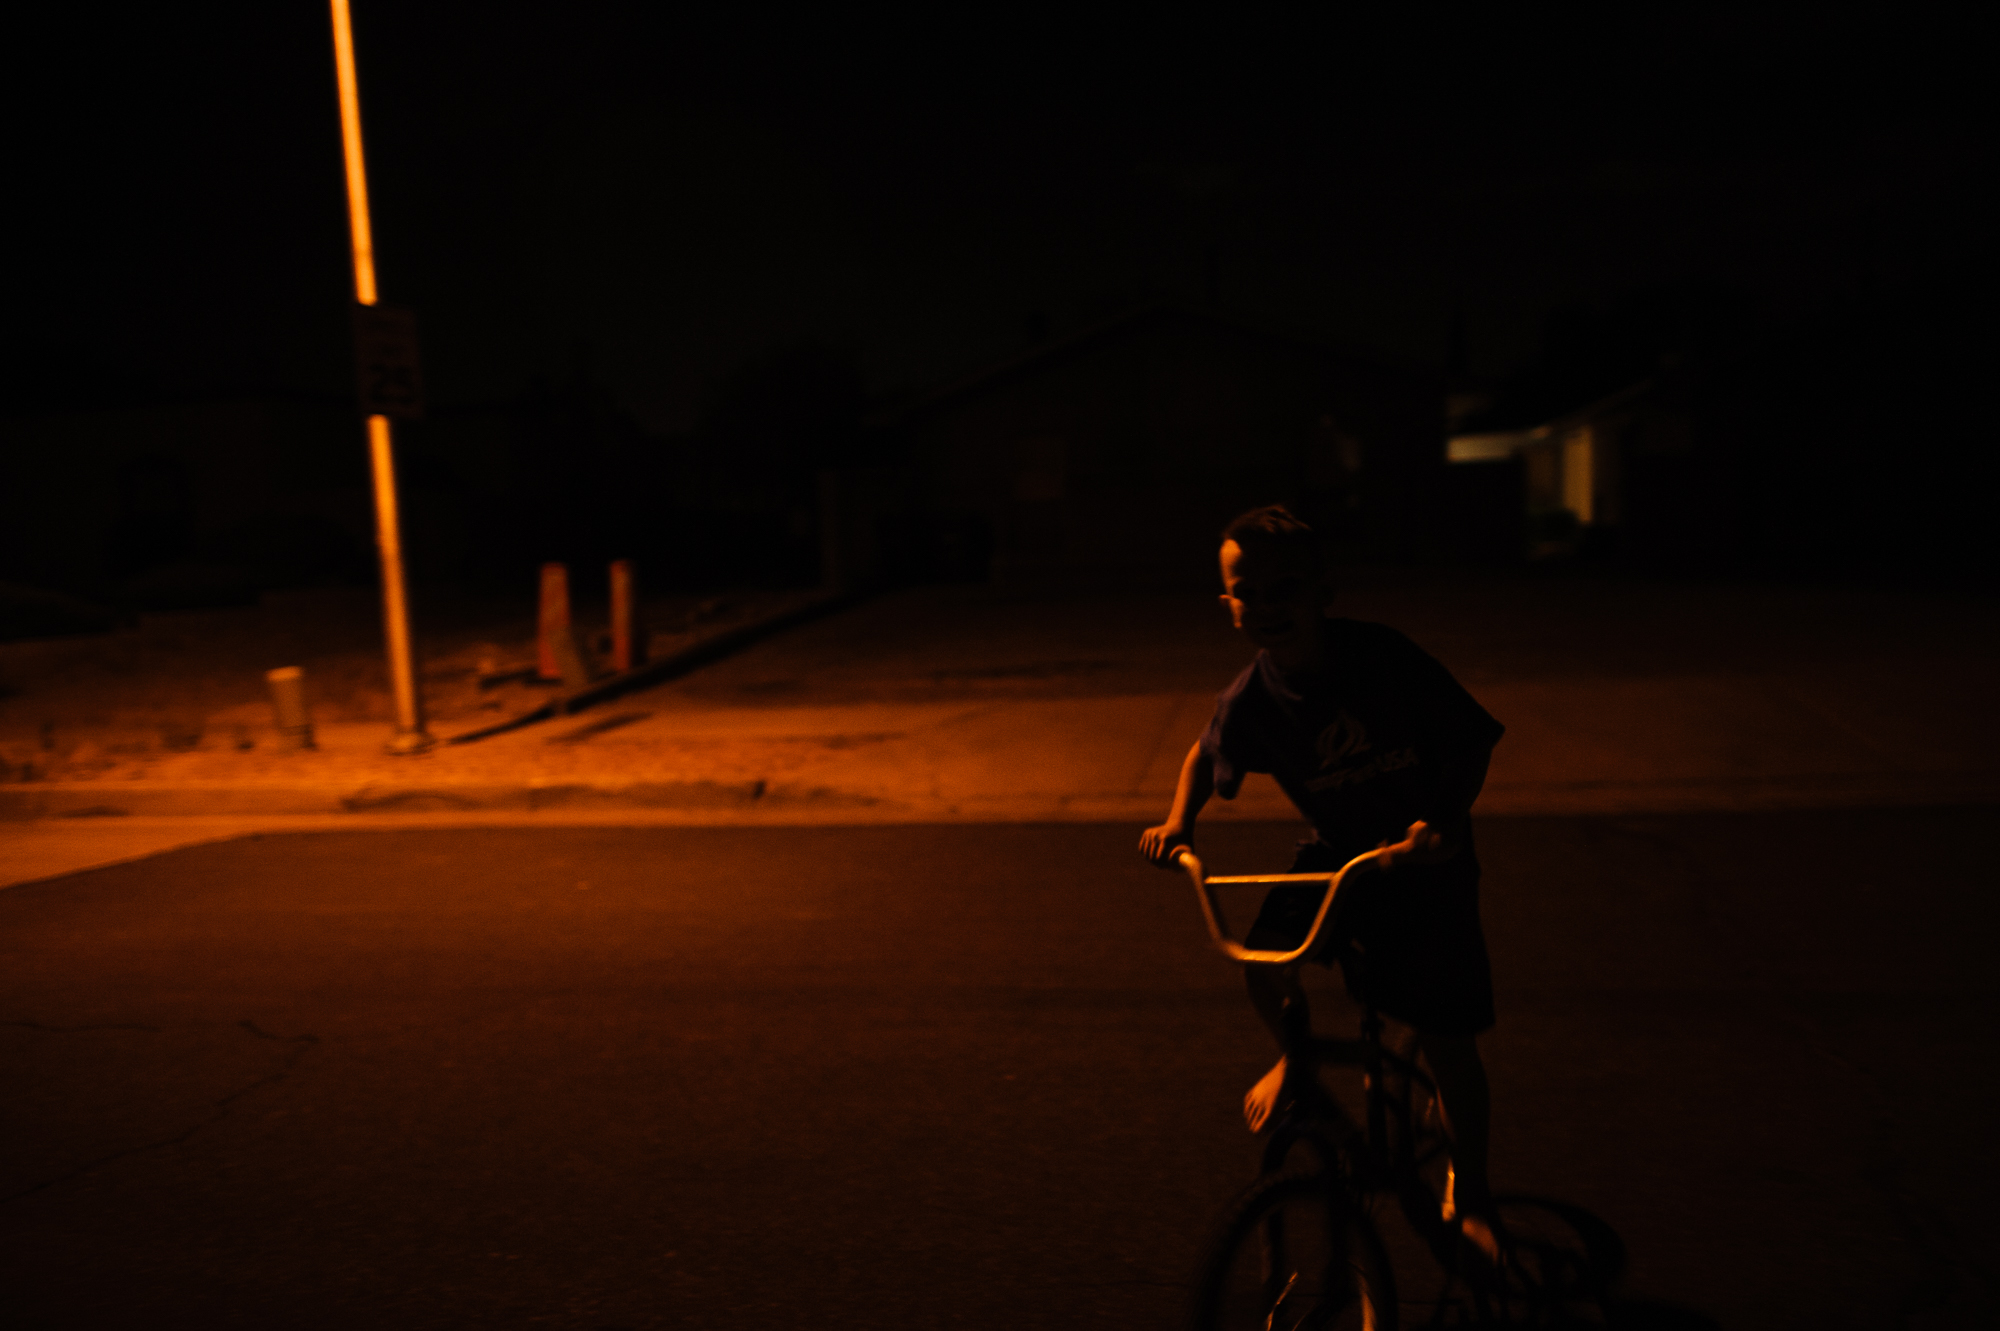 Michael, age 7, rides a bike at night, 2012.